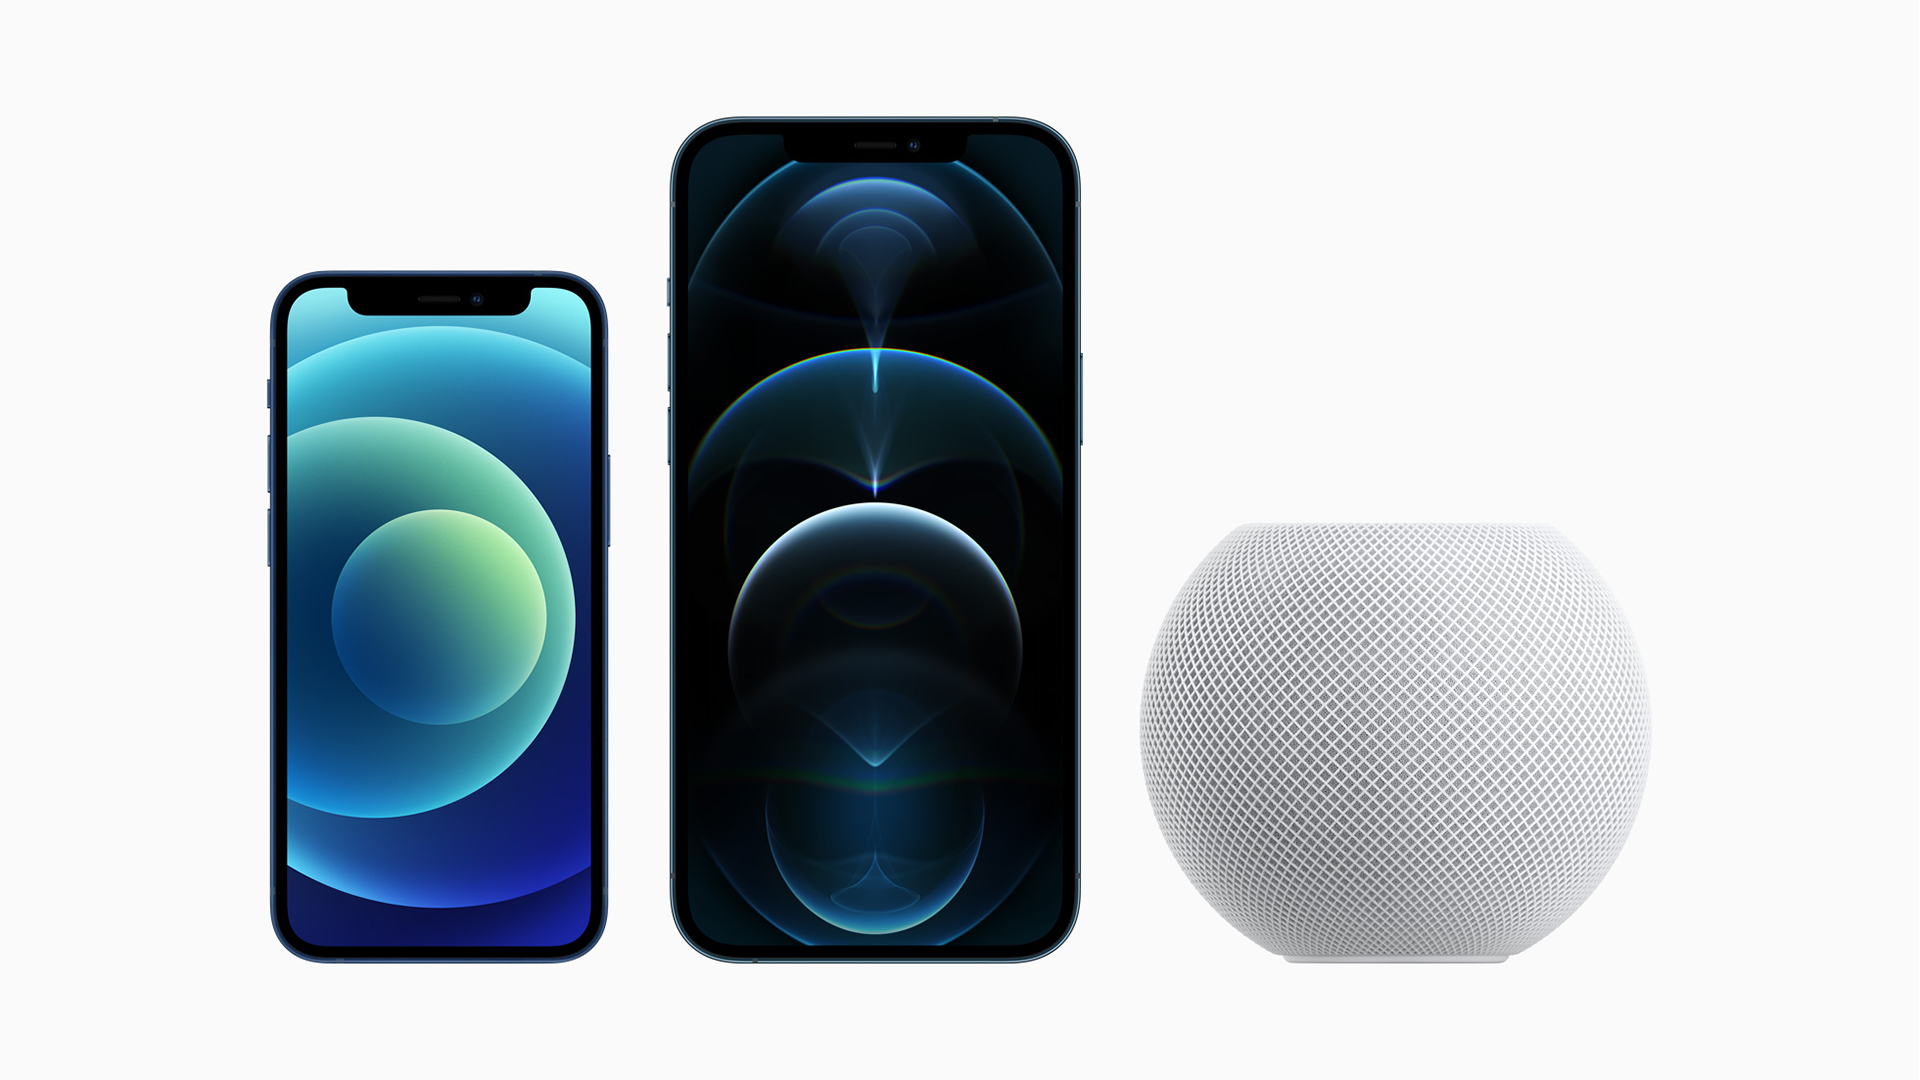 Apple iPhone 12 mini, iPhone 12 Pro Max, HomePod mini Go on Pre-Order in India: Price, Specs